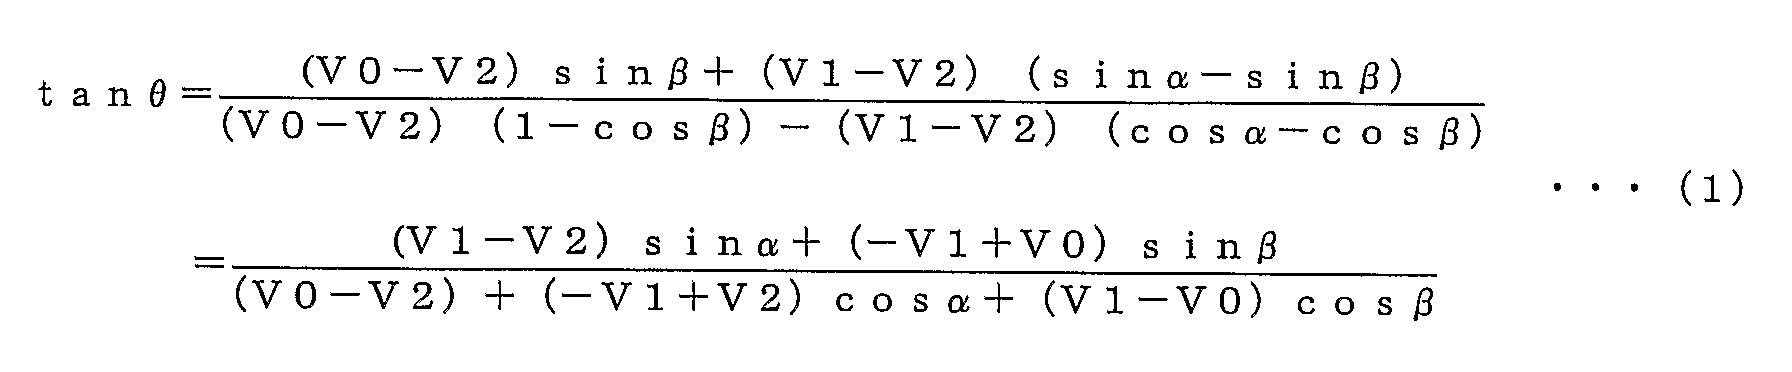 Figure 112006043241127-pct00003